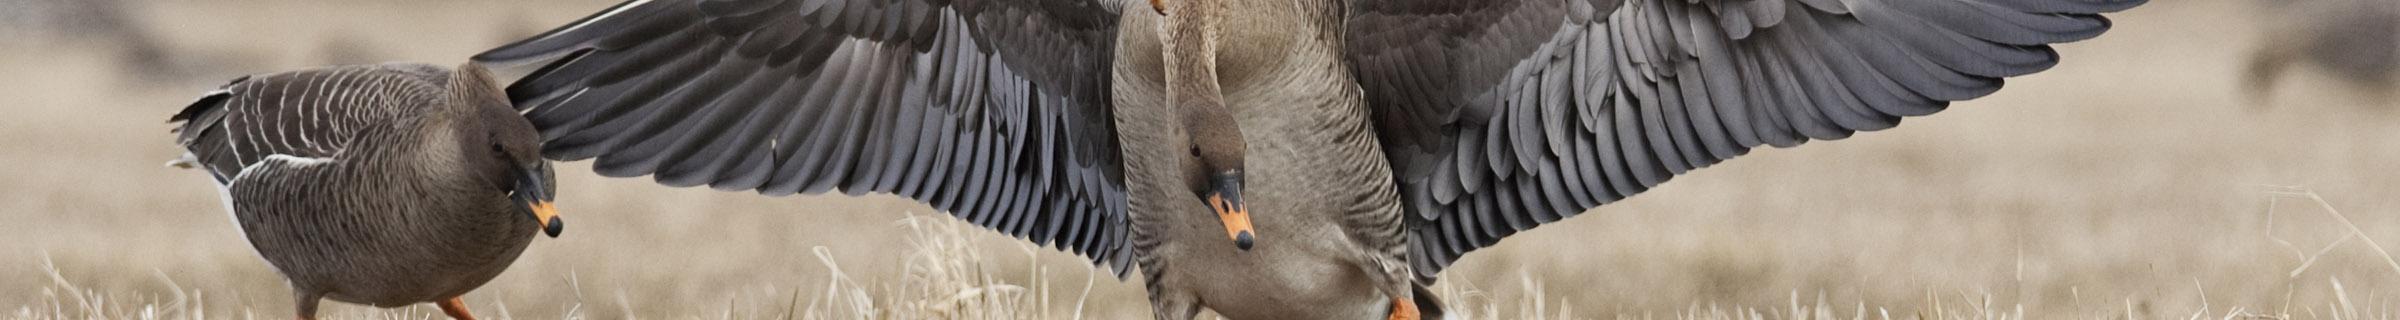 Taiga Bean Goose © Jari Peltomaki